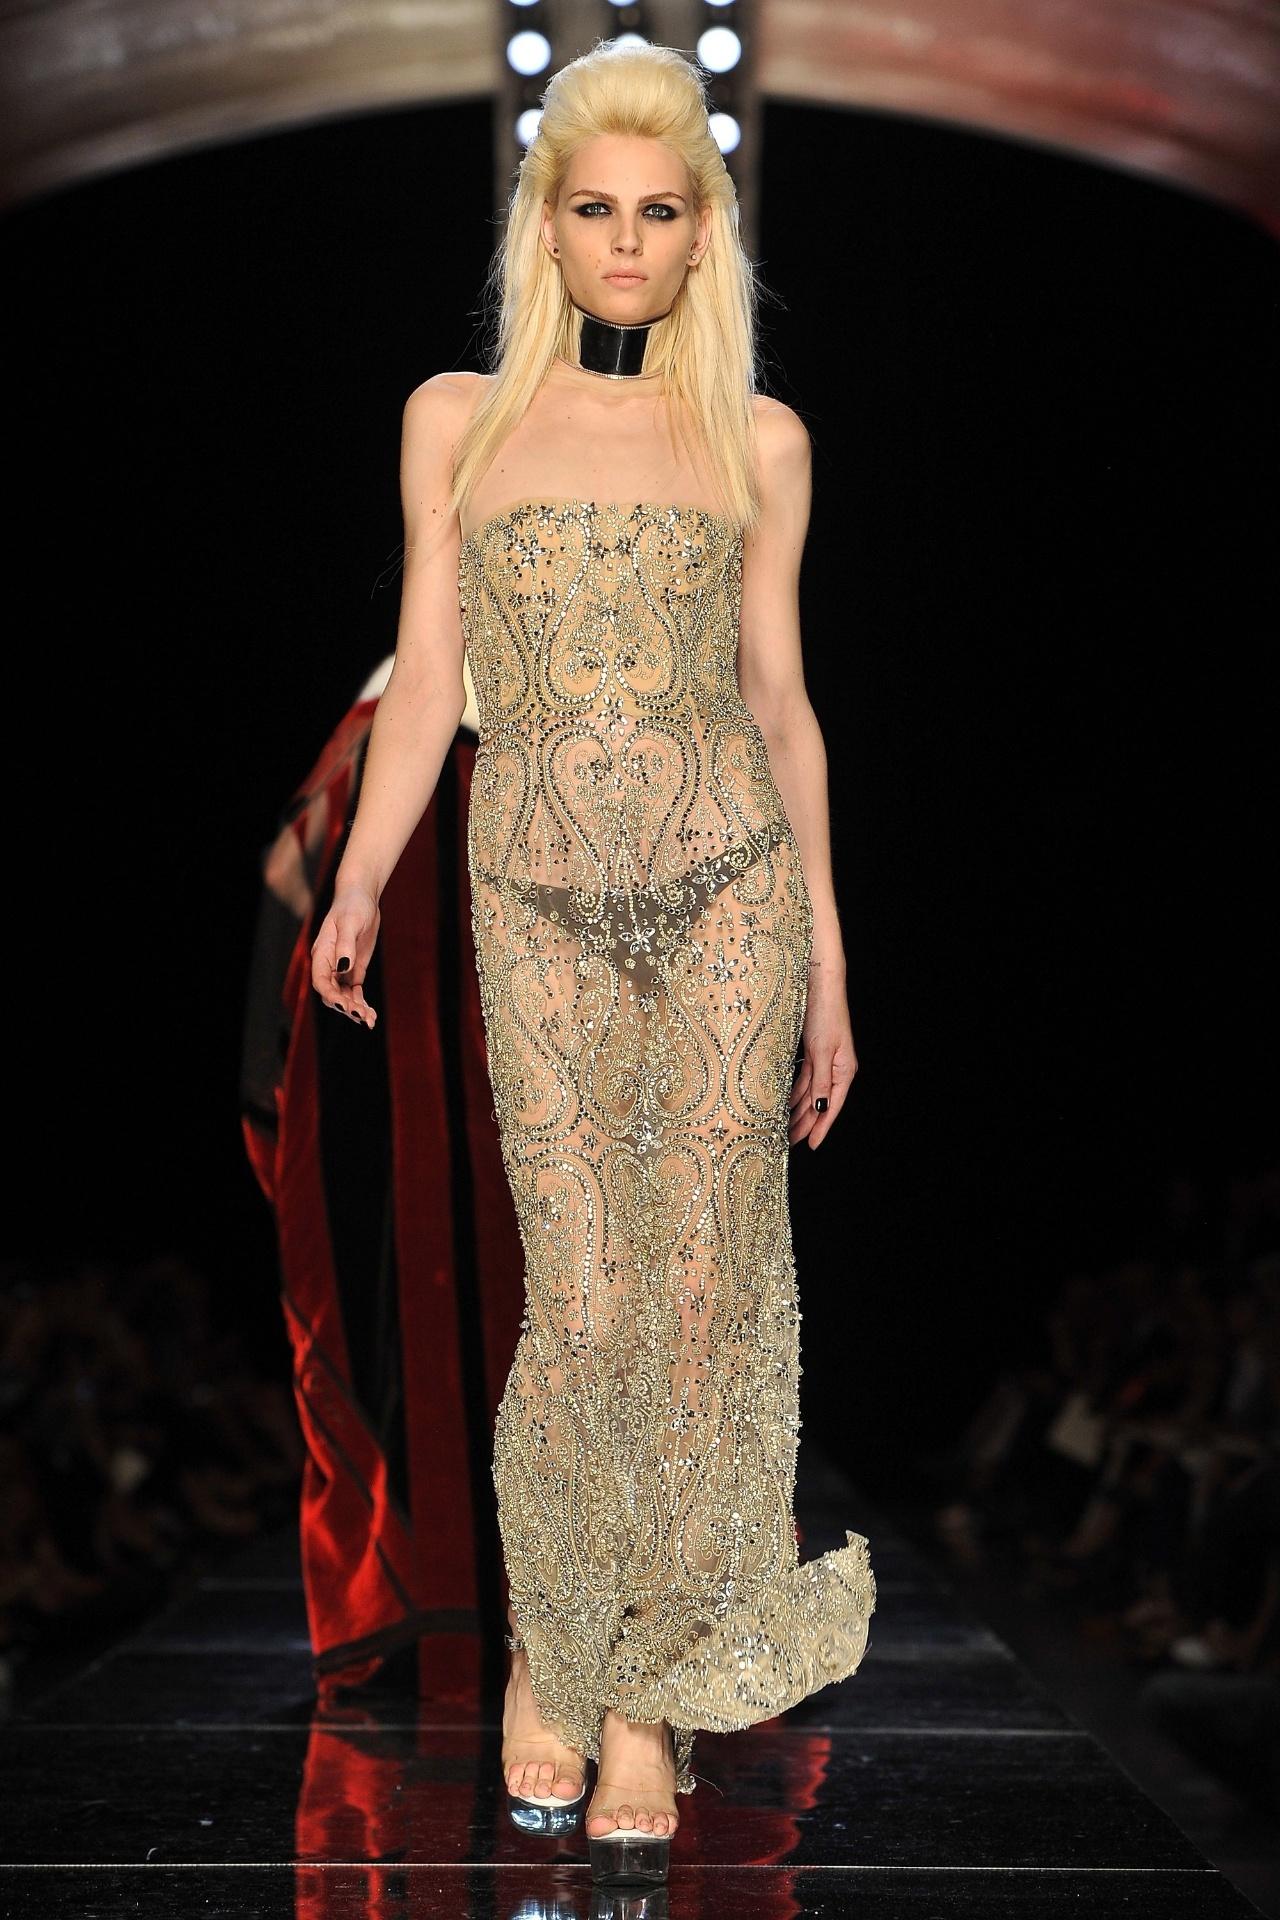 4.jul.2012 - Andrej Pejic desfila para Jean-Paul Gaultier na Semana de alta-costura de Paris